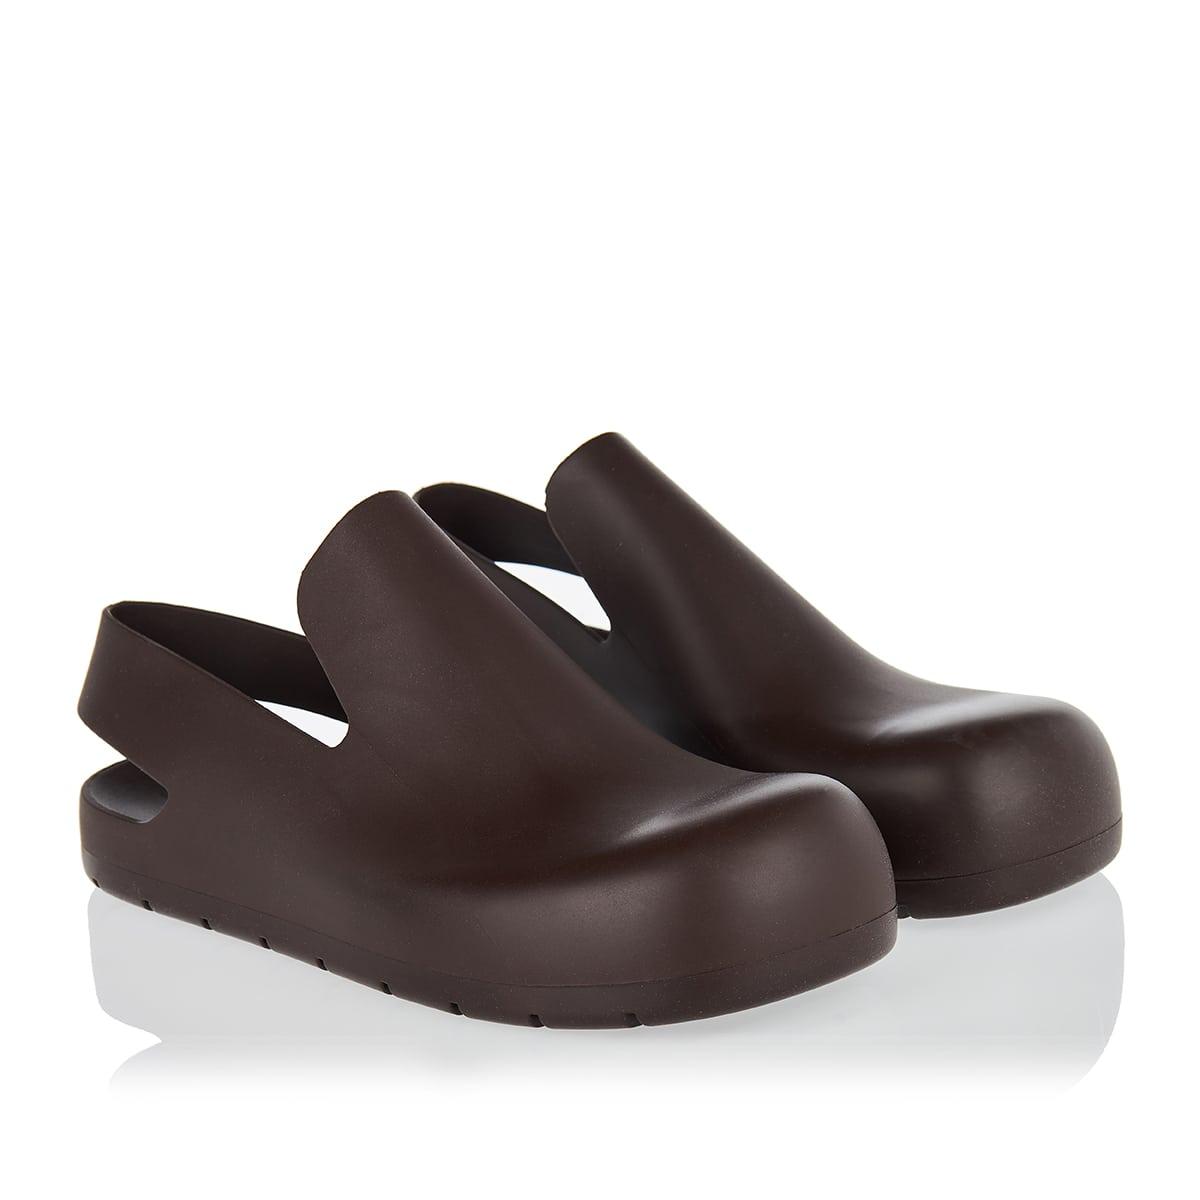 Puddle rubber sandals